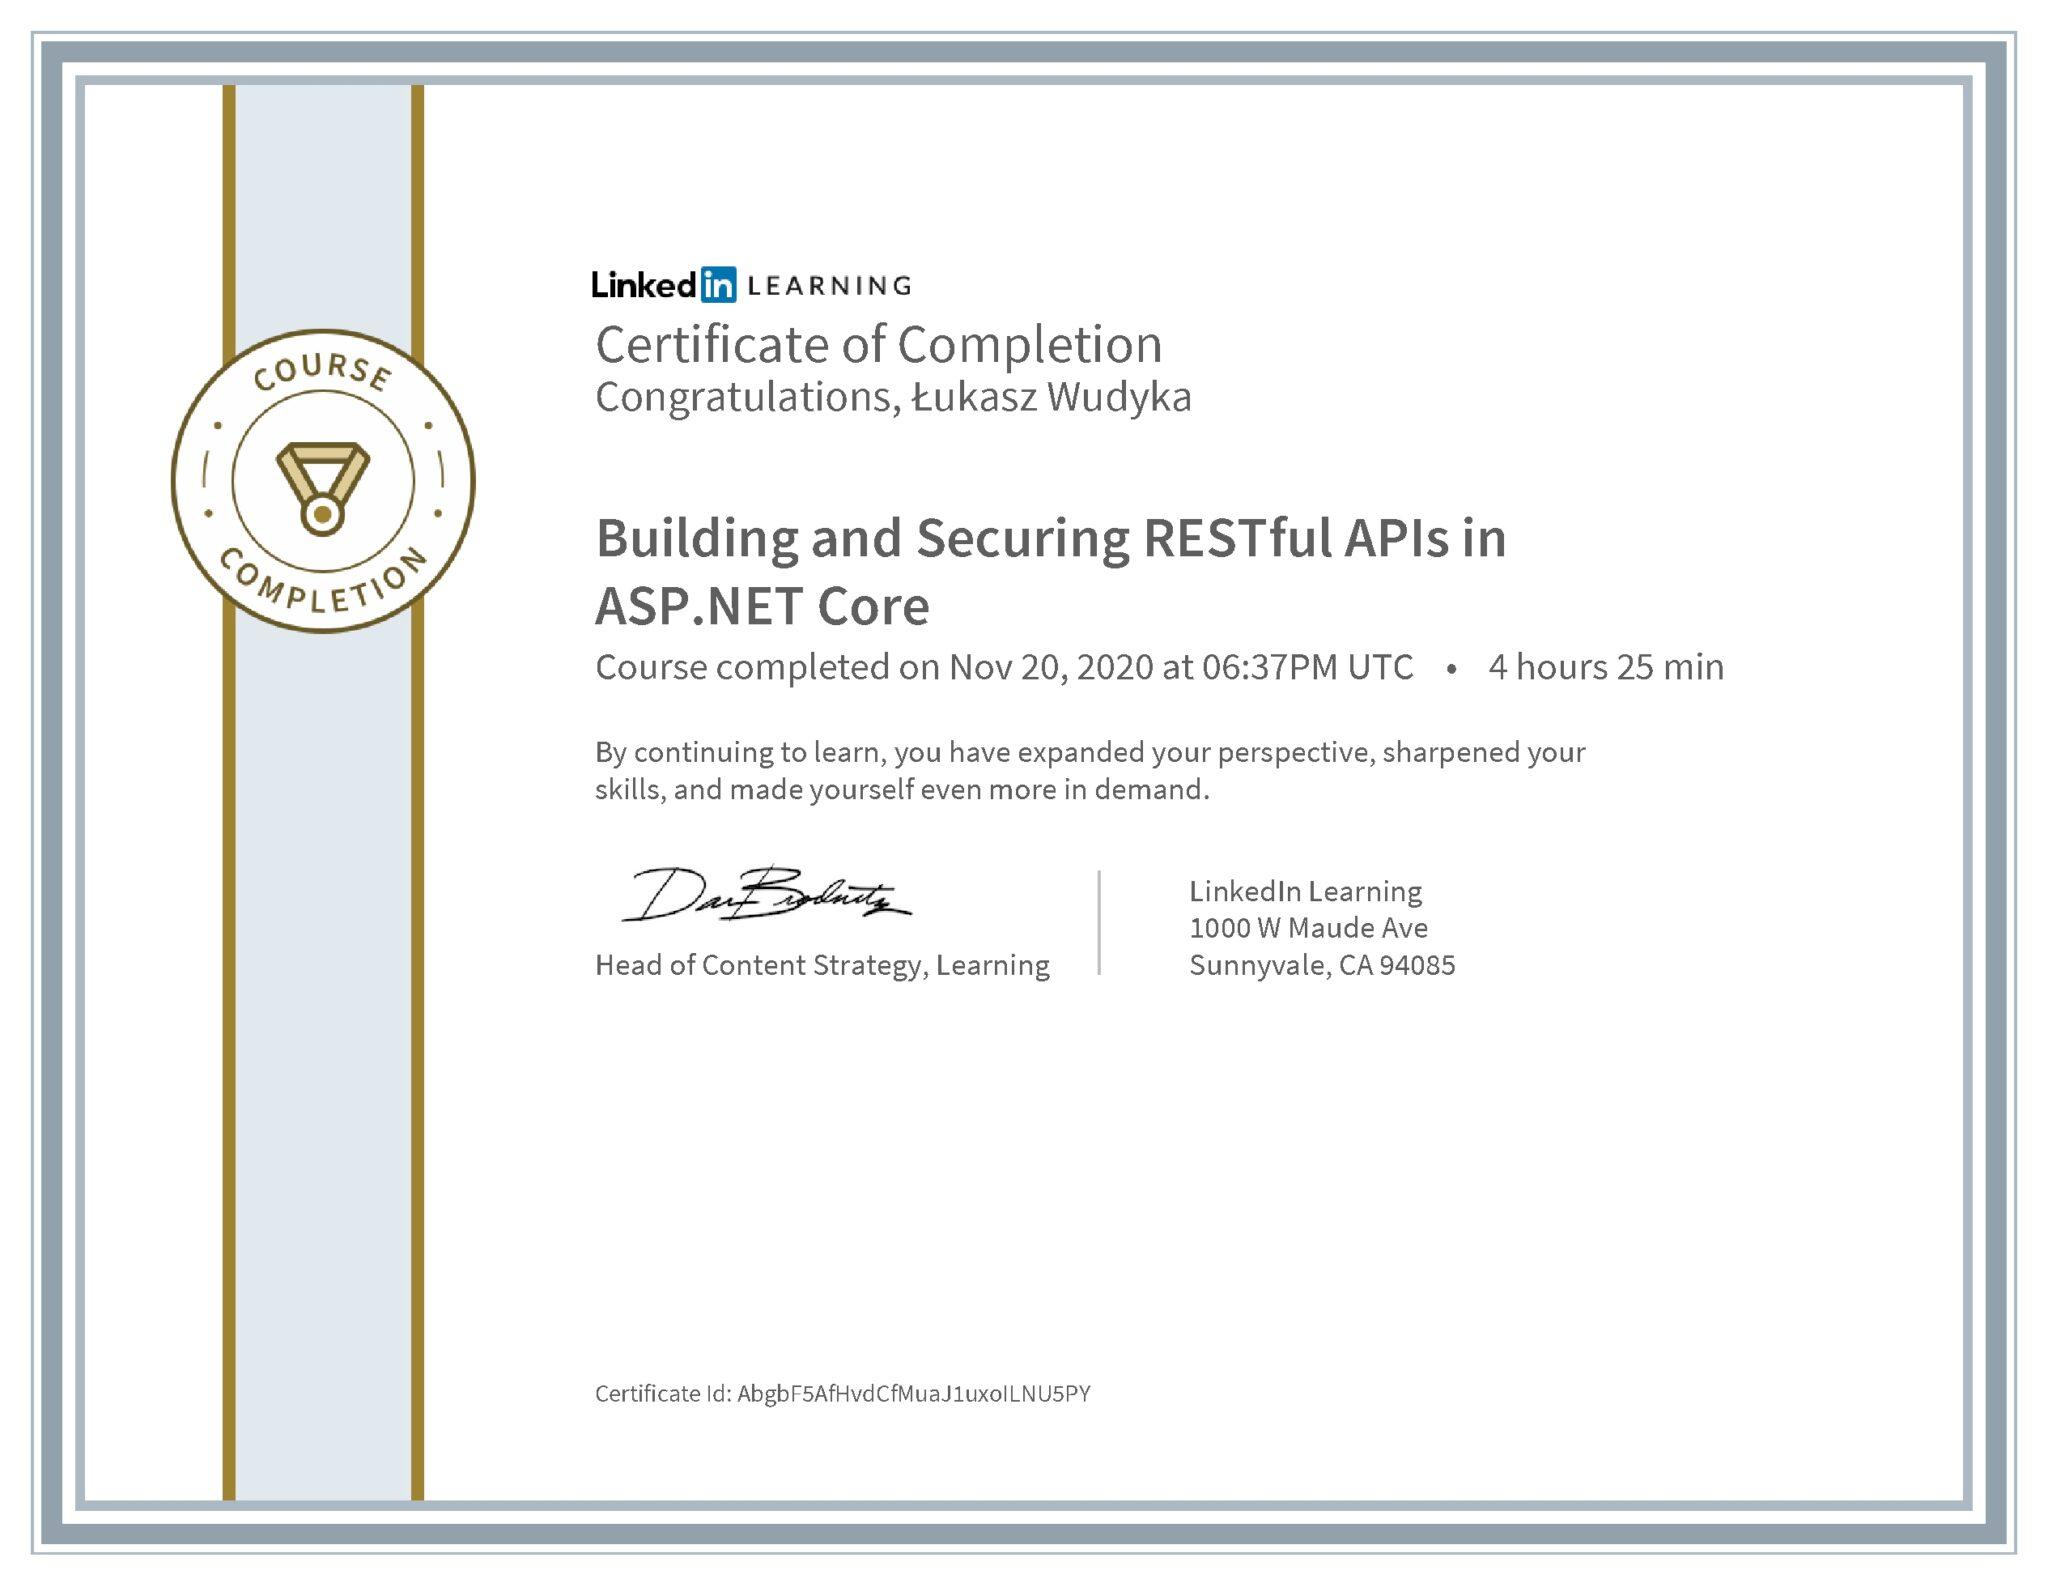 Łukasz Wudyka certyfikat LinkedIn Building and Securing RESTful APIs in ASP.NET Core